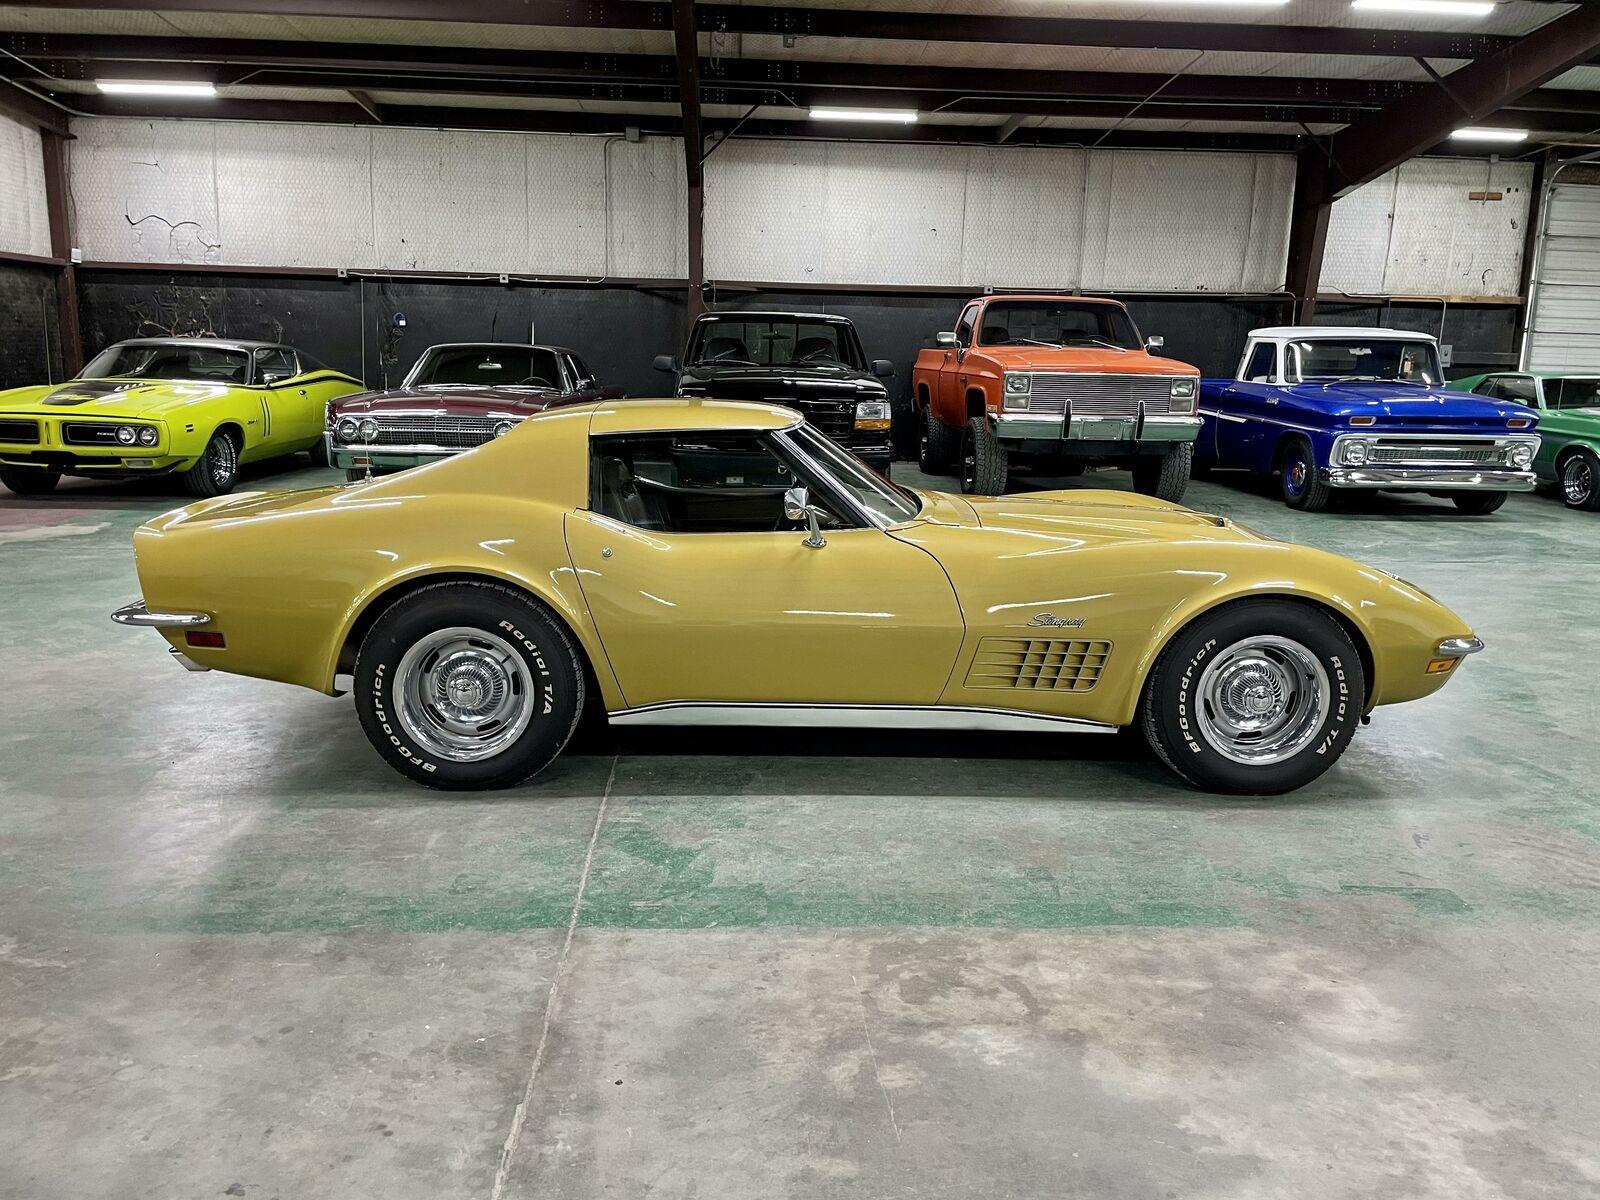 1972 Yellow Chevrolet Corvette   | C3 Corvette Photo 6